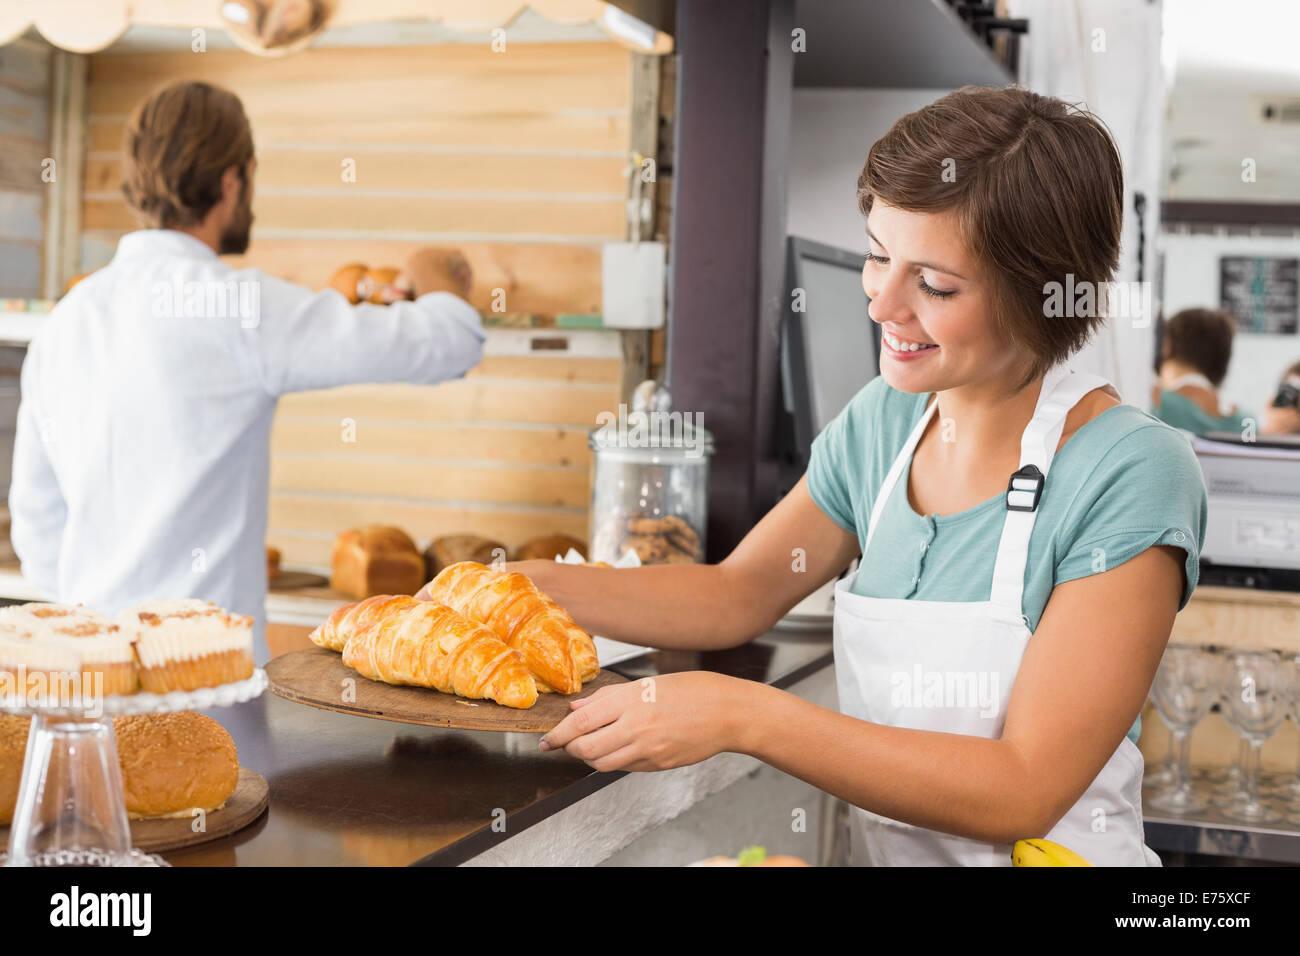 Pretty waitress holding tray of croissants - Stock Image